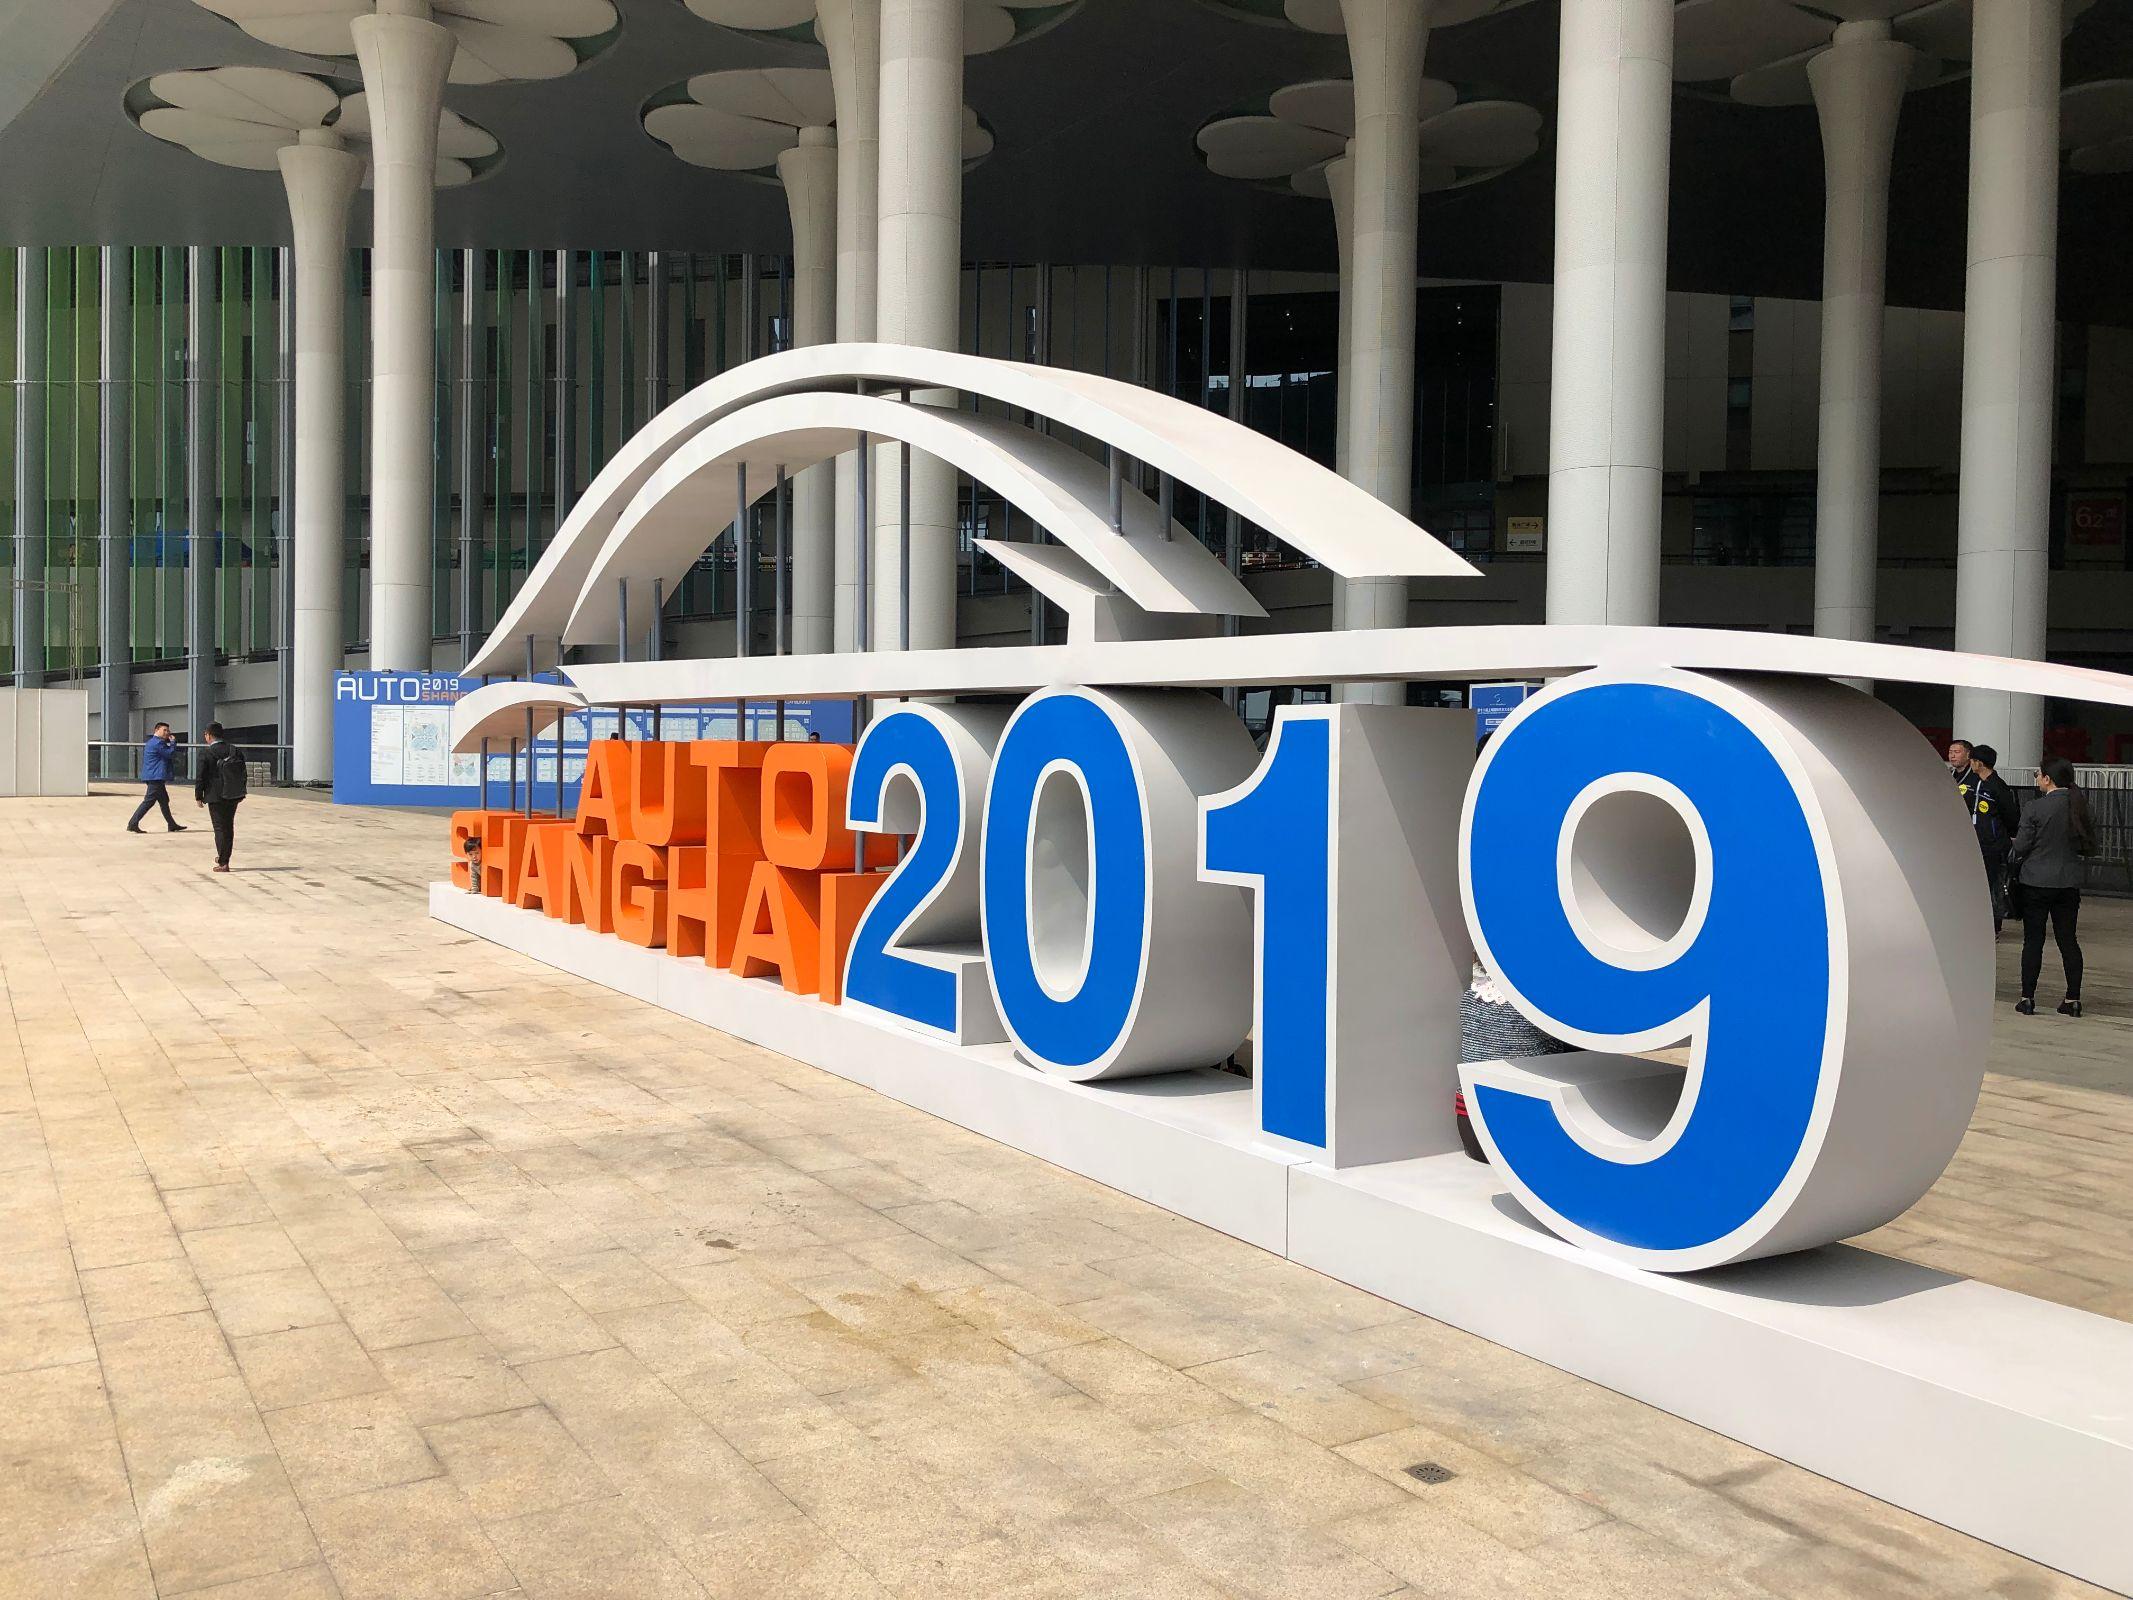 salao de xangai 2019